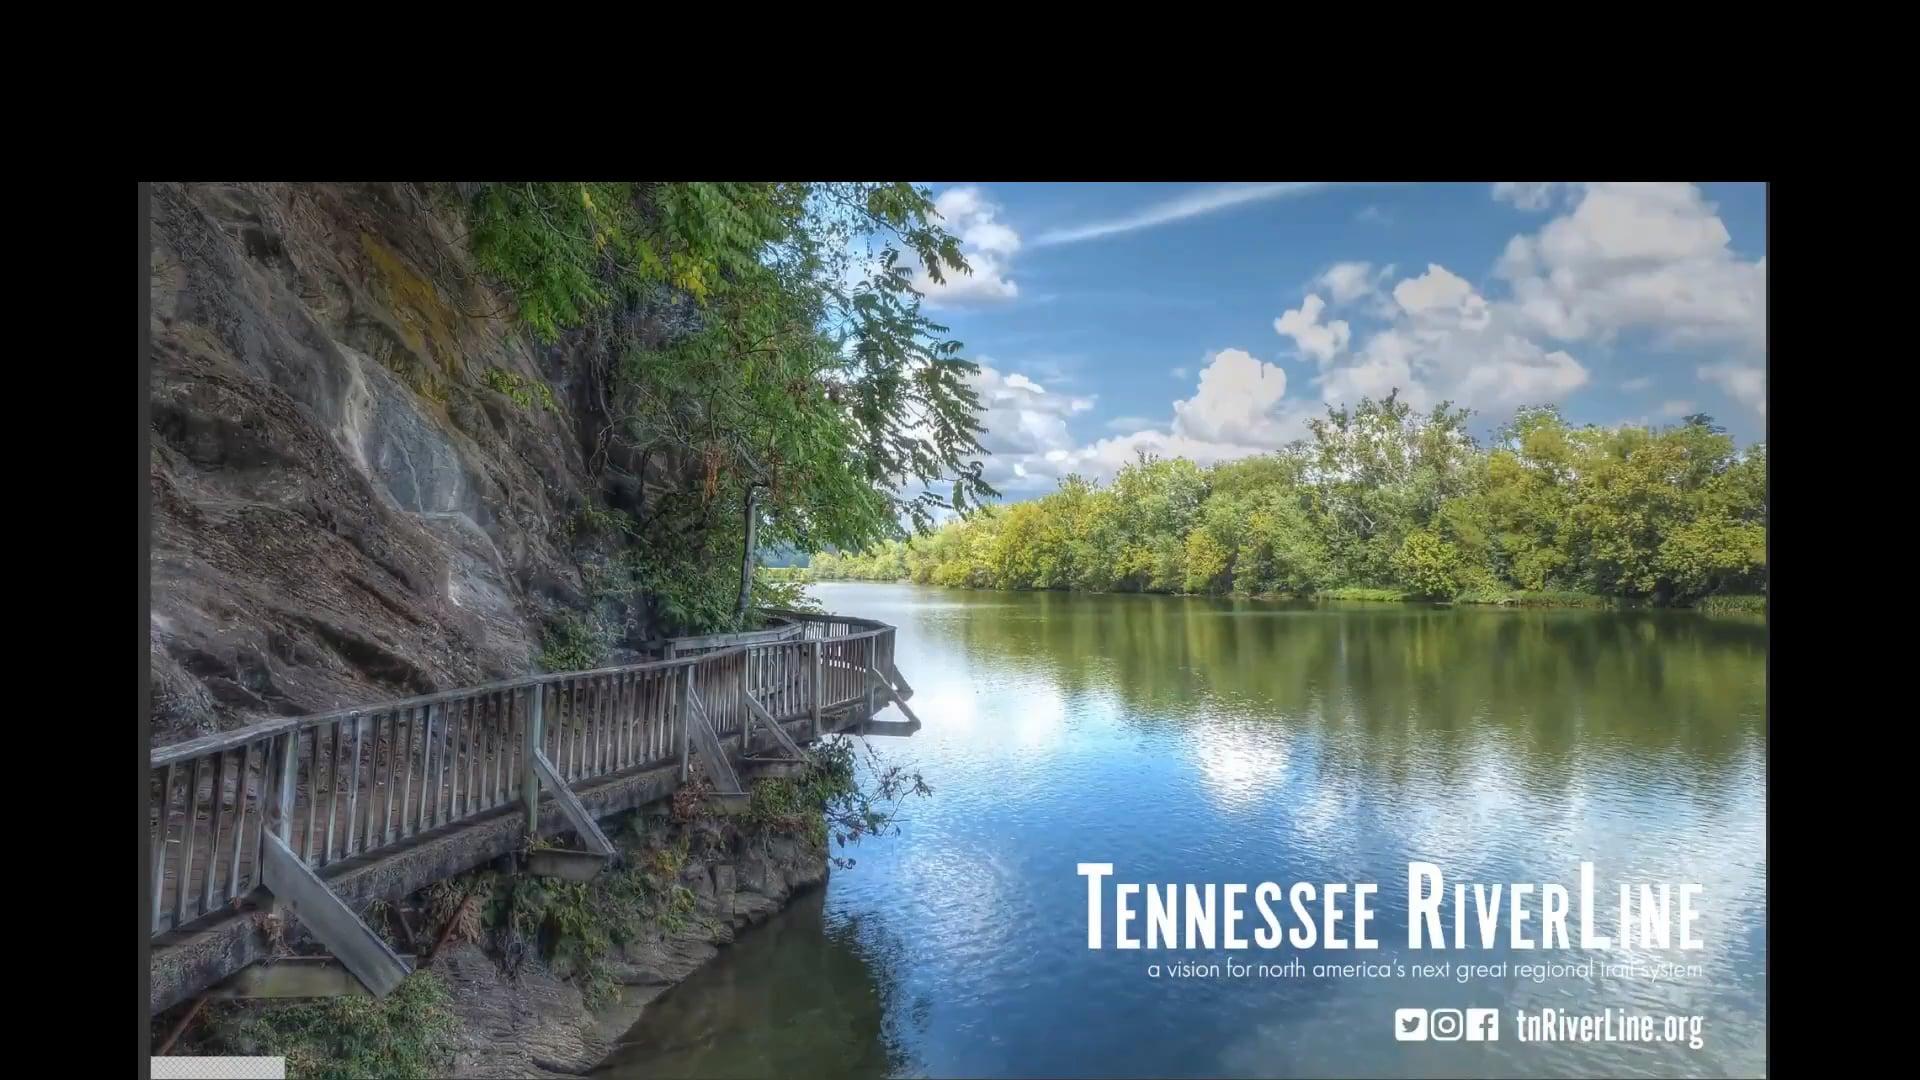 Quartelry Webinar Series - TN RiverLine with Dr. Brad Collett